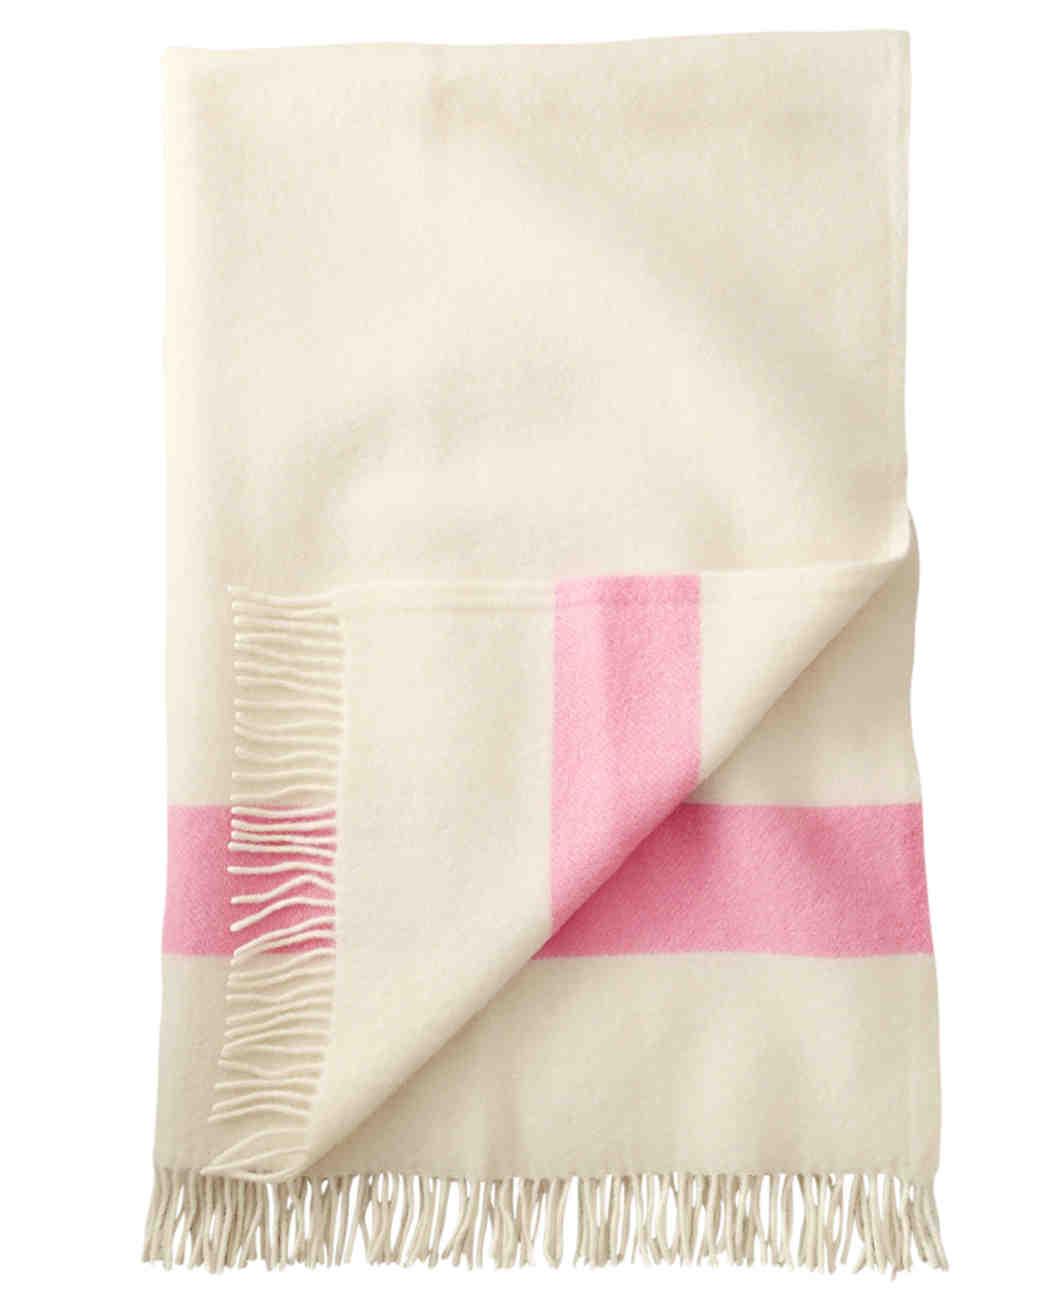 valentines-gift-guide-her-blanket-0115.jpg